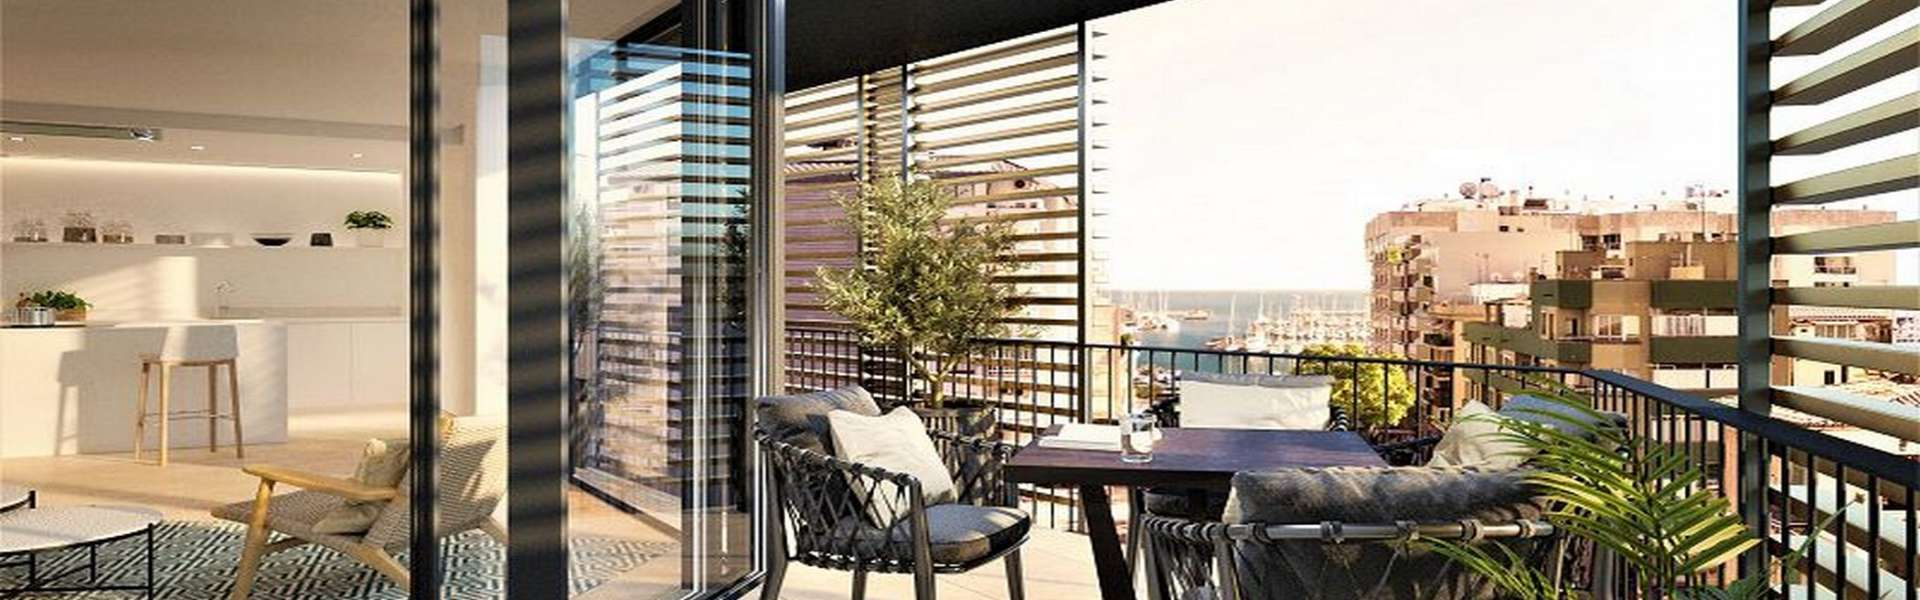 Palma/Santa Catalina - Newly built apartments in top location